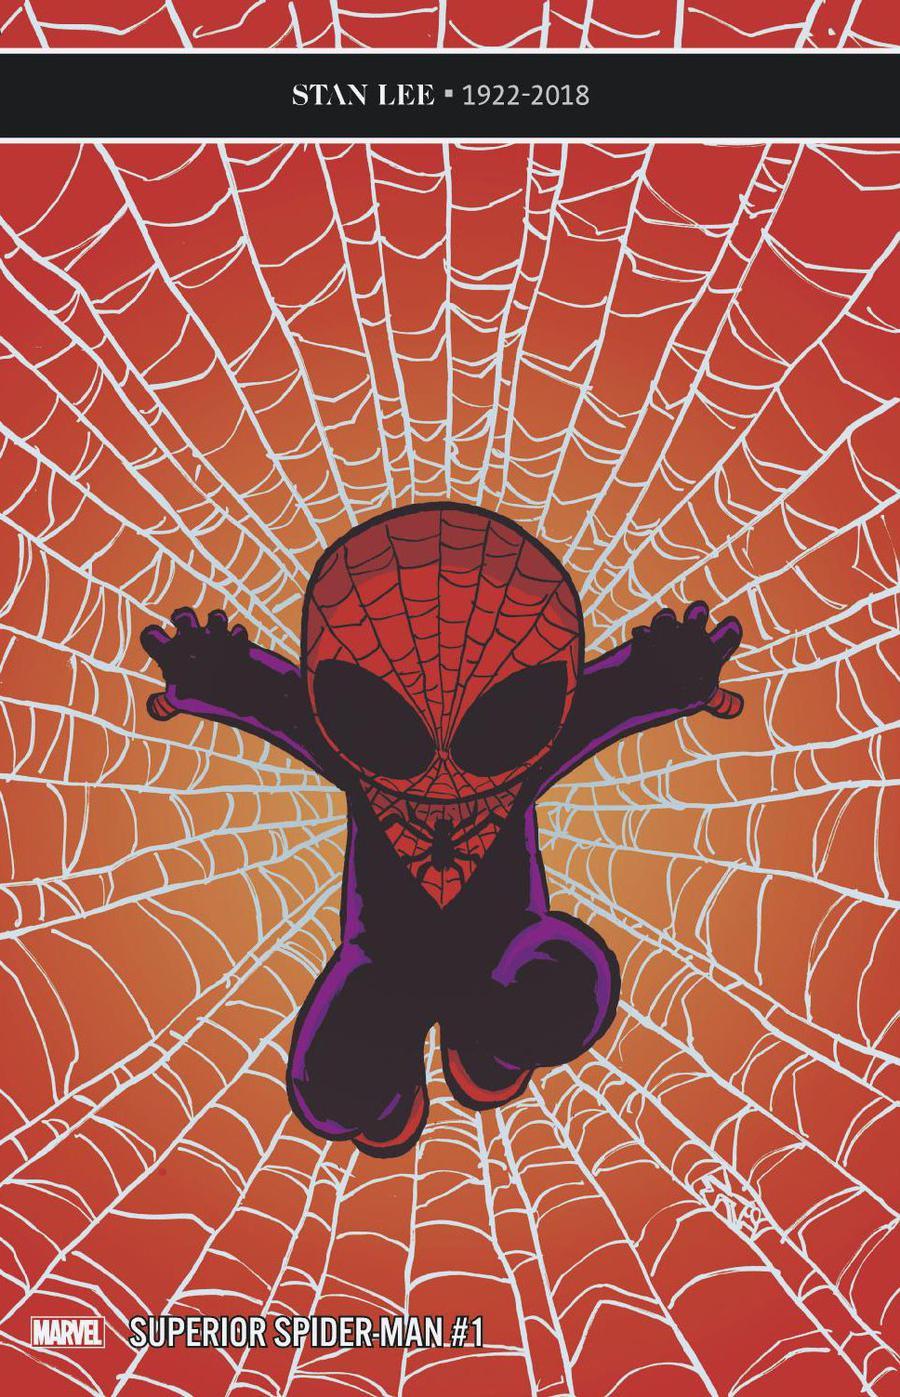 Superior Spider-Man Vol 2 #1 Cover C Variant Skottie Young Baby Cover (Spider-Geddon Tie-In)